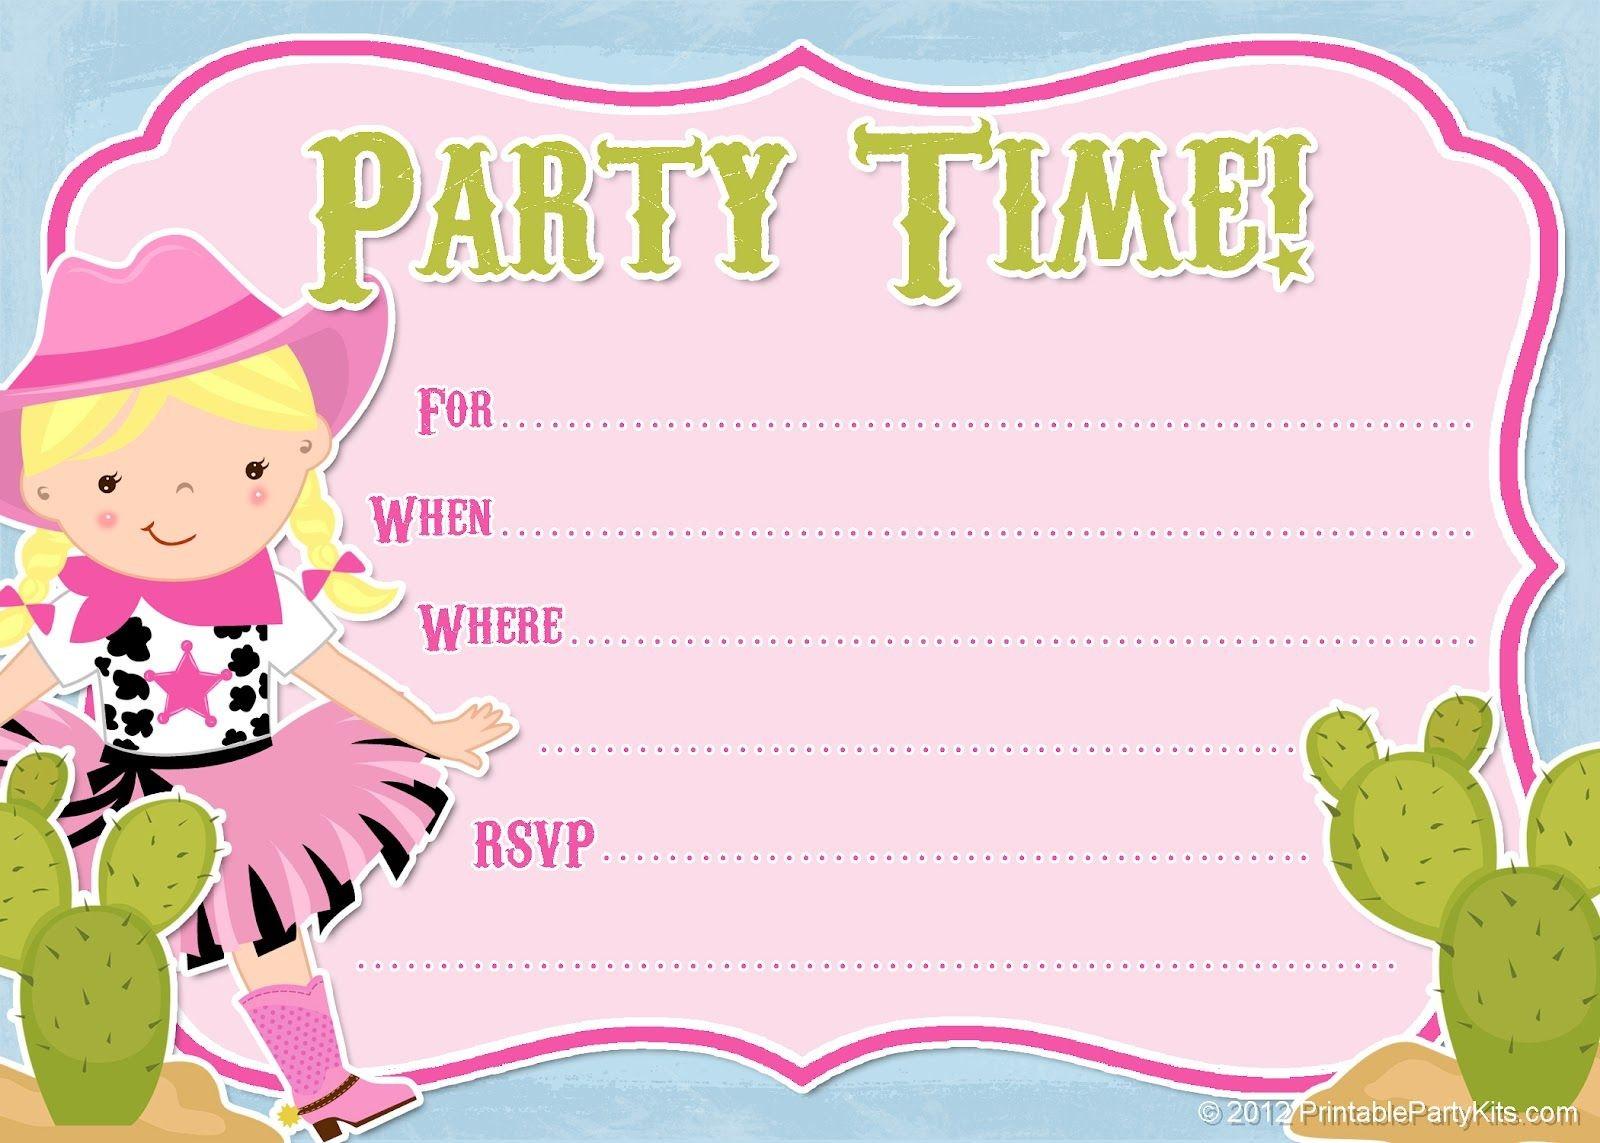 Cowgirl Birthday Invitations Free Printable Party Invitation From - Free Printable Party Invitations